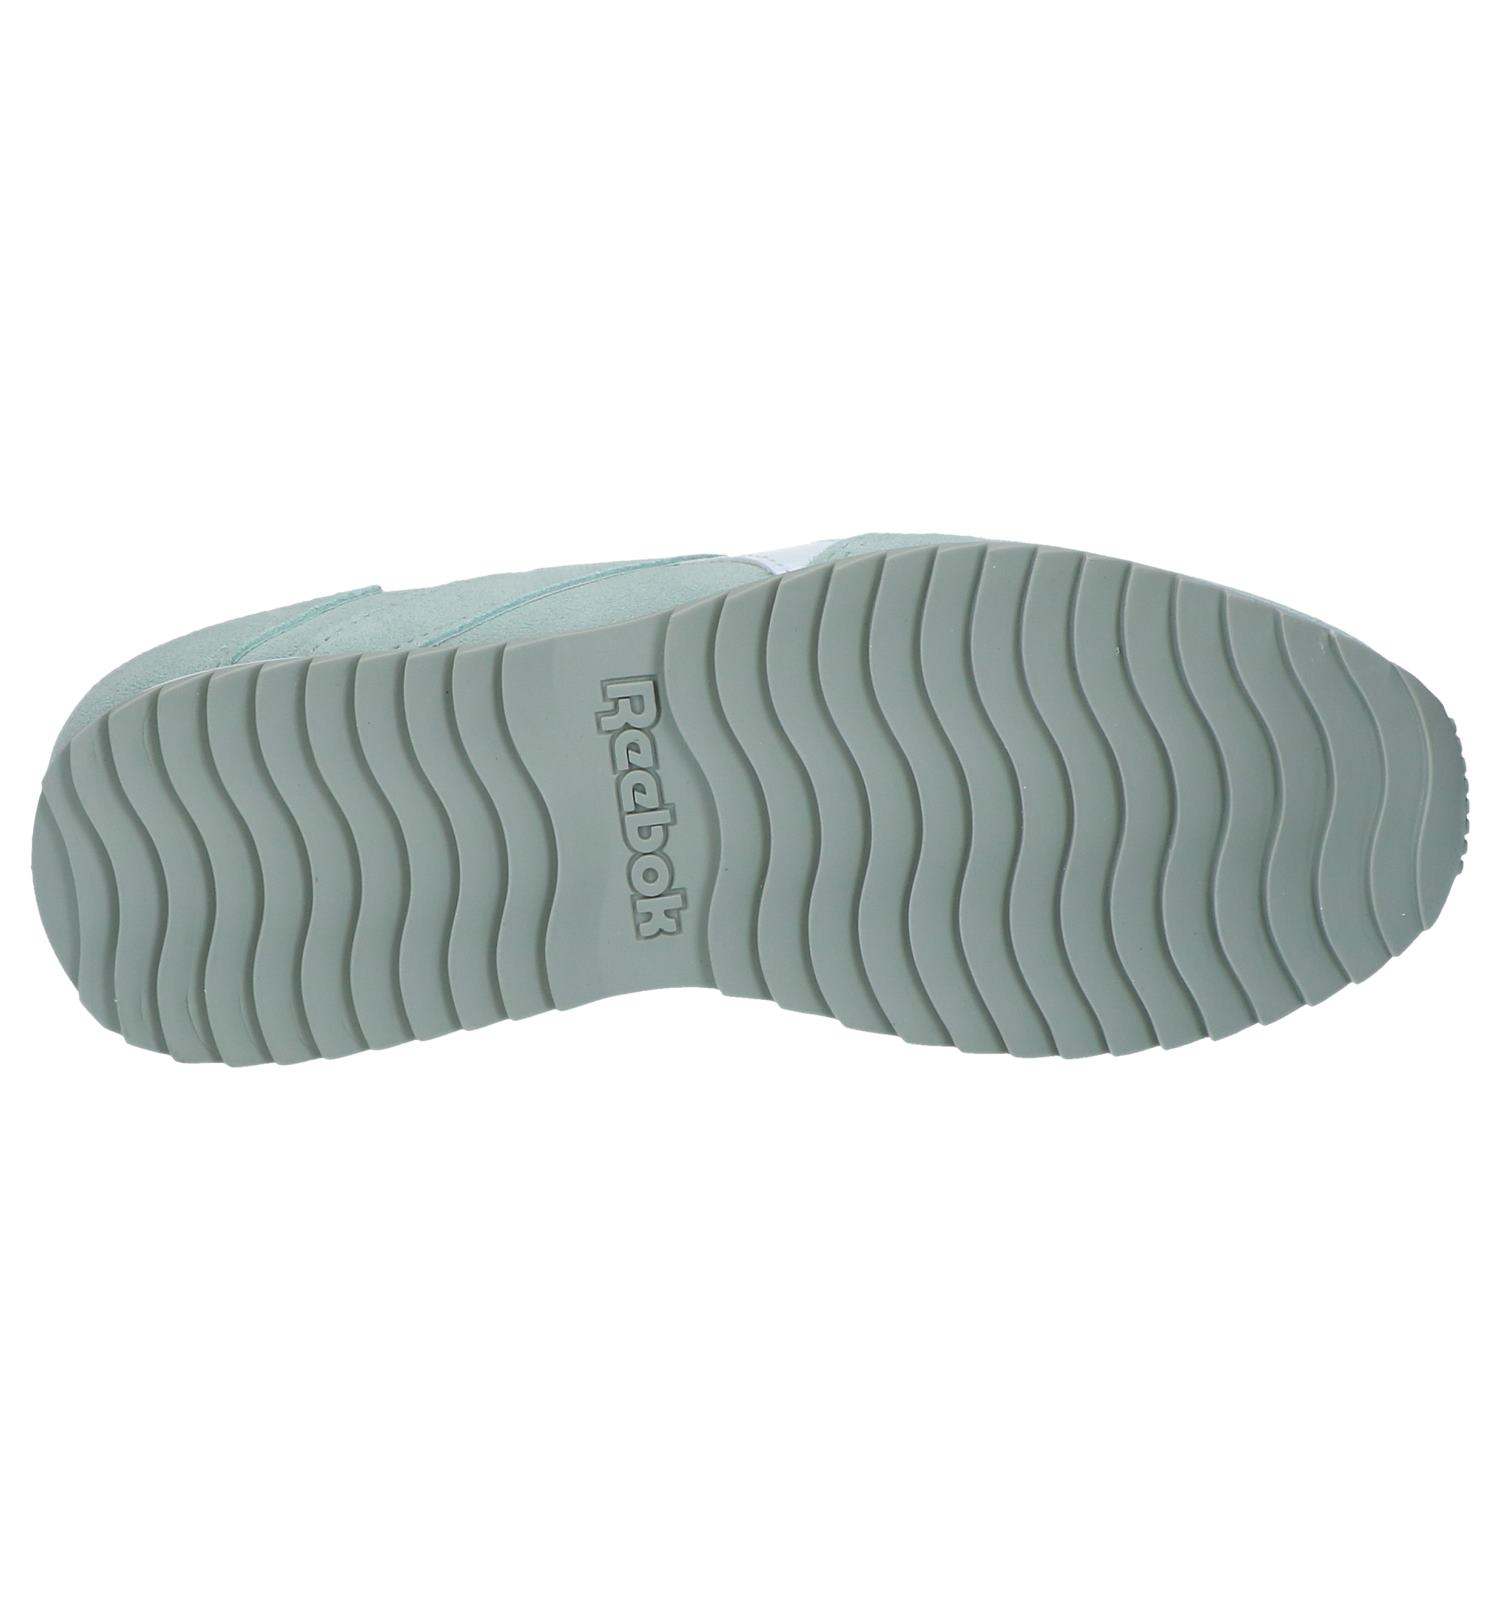 99022505c90 Muntgroene Sneakers Reebok Royal Glide | TORFS.BE | Gratis verzend en retour